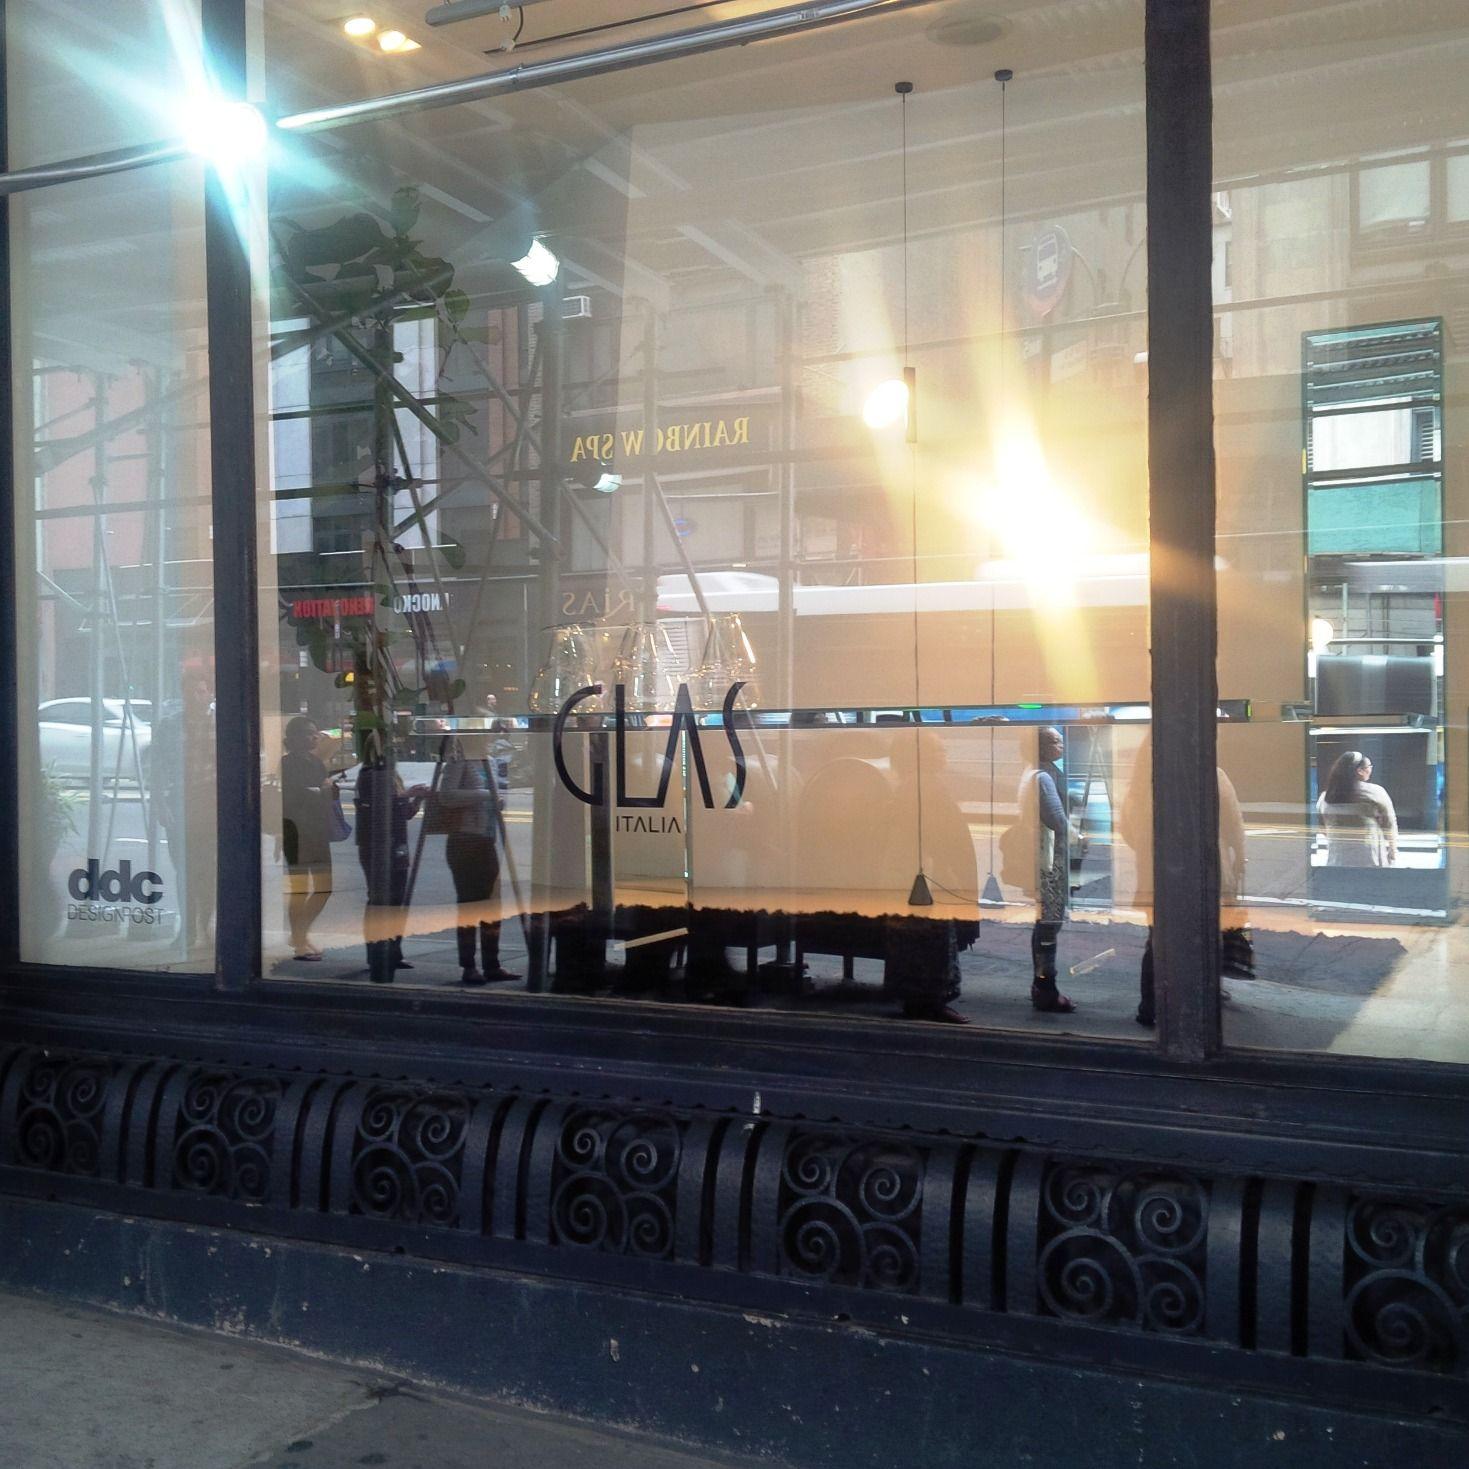 #GLASITALIA shopinshop at #DDC DESIGNPOST #NY City May 2015 181 Madison Avenue at 34th St NYC ddcnyc.com glasitalia.com